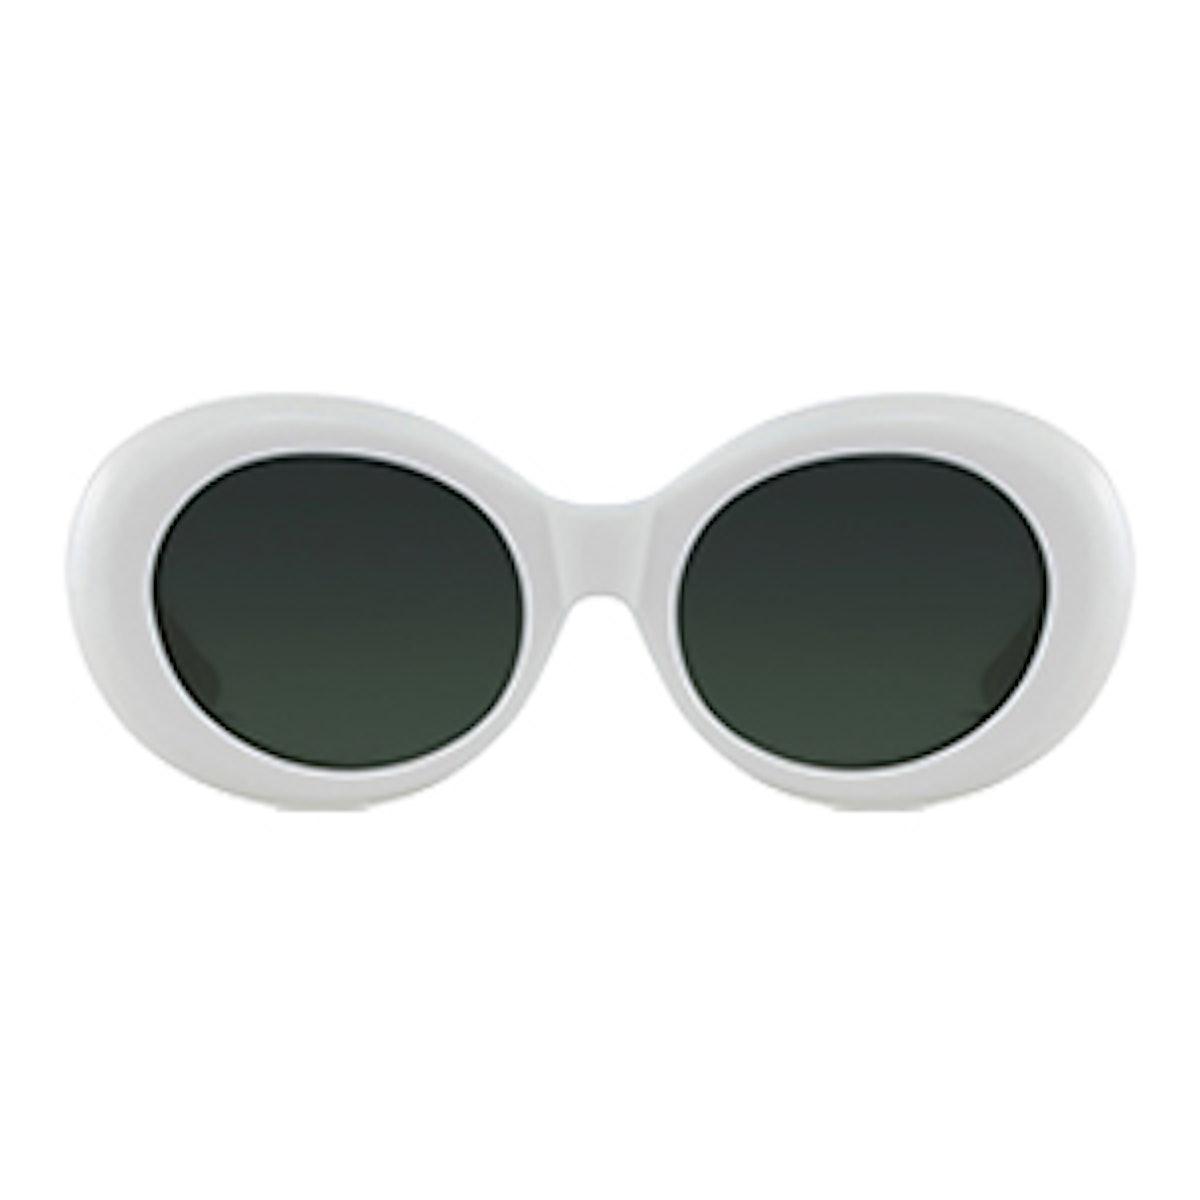 Figurative Sunglasses